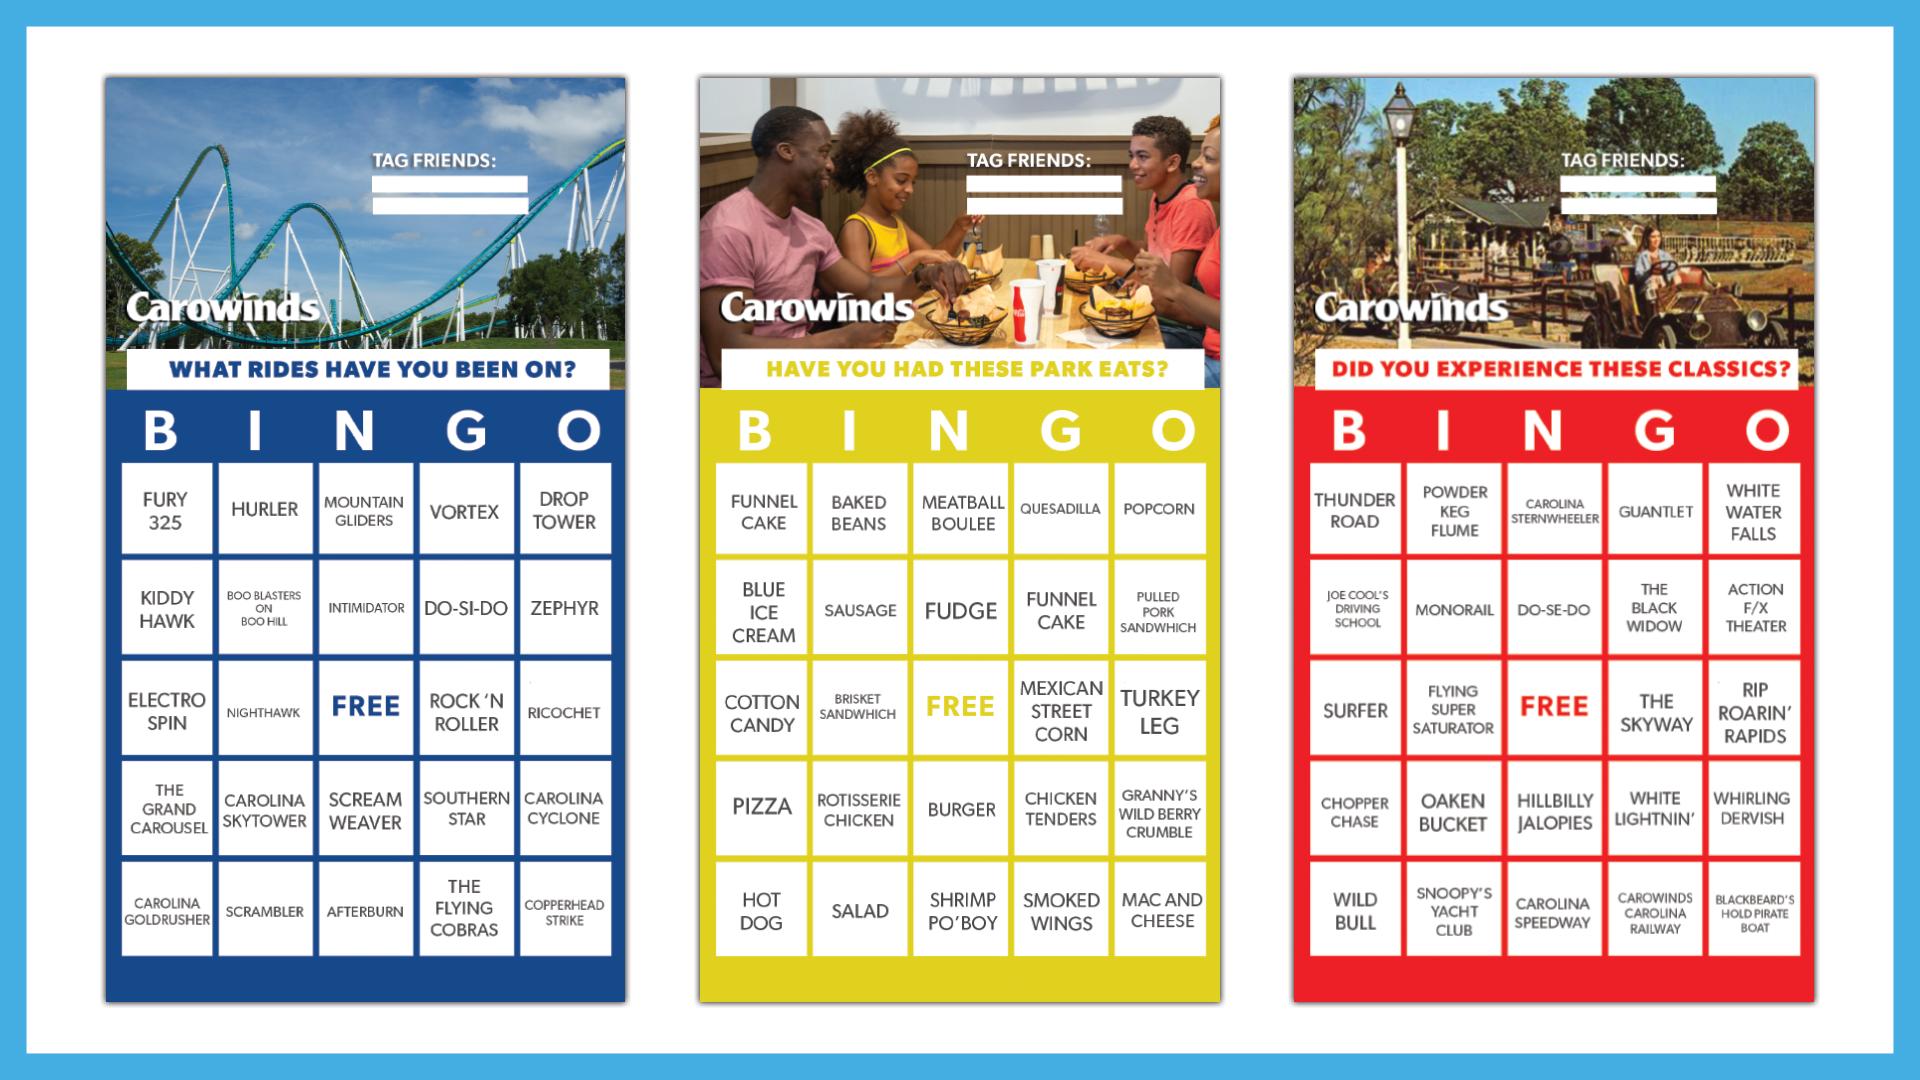 Carowinds Bingo - Carowinds With Regard To Turning Stone Bingo Calendar 2021 November